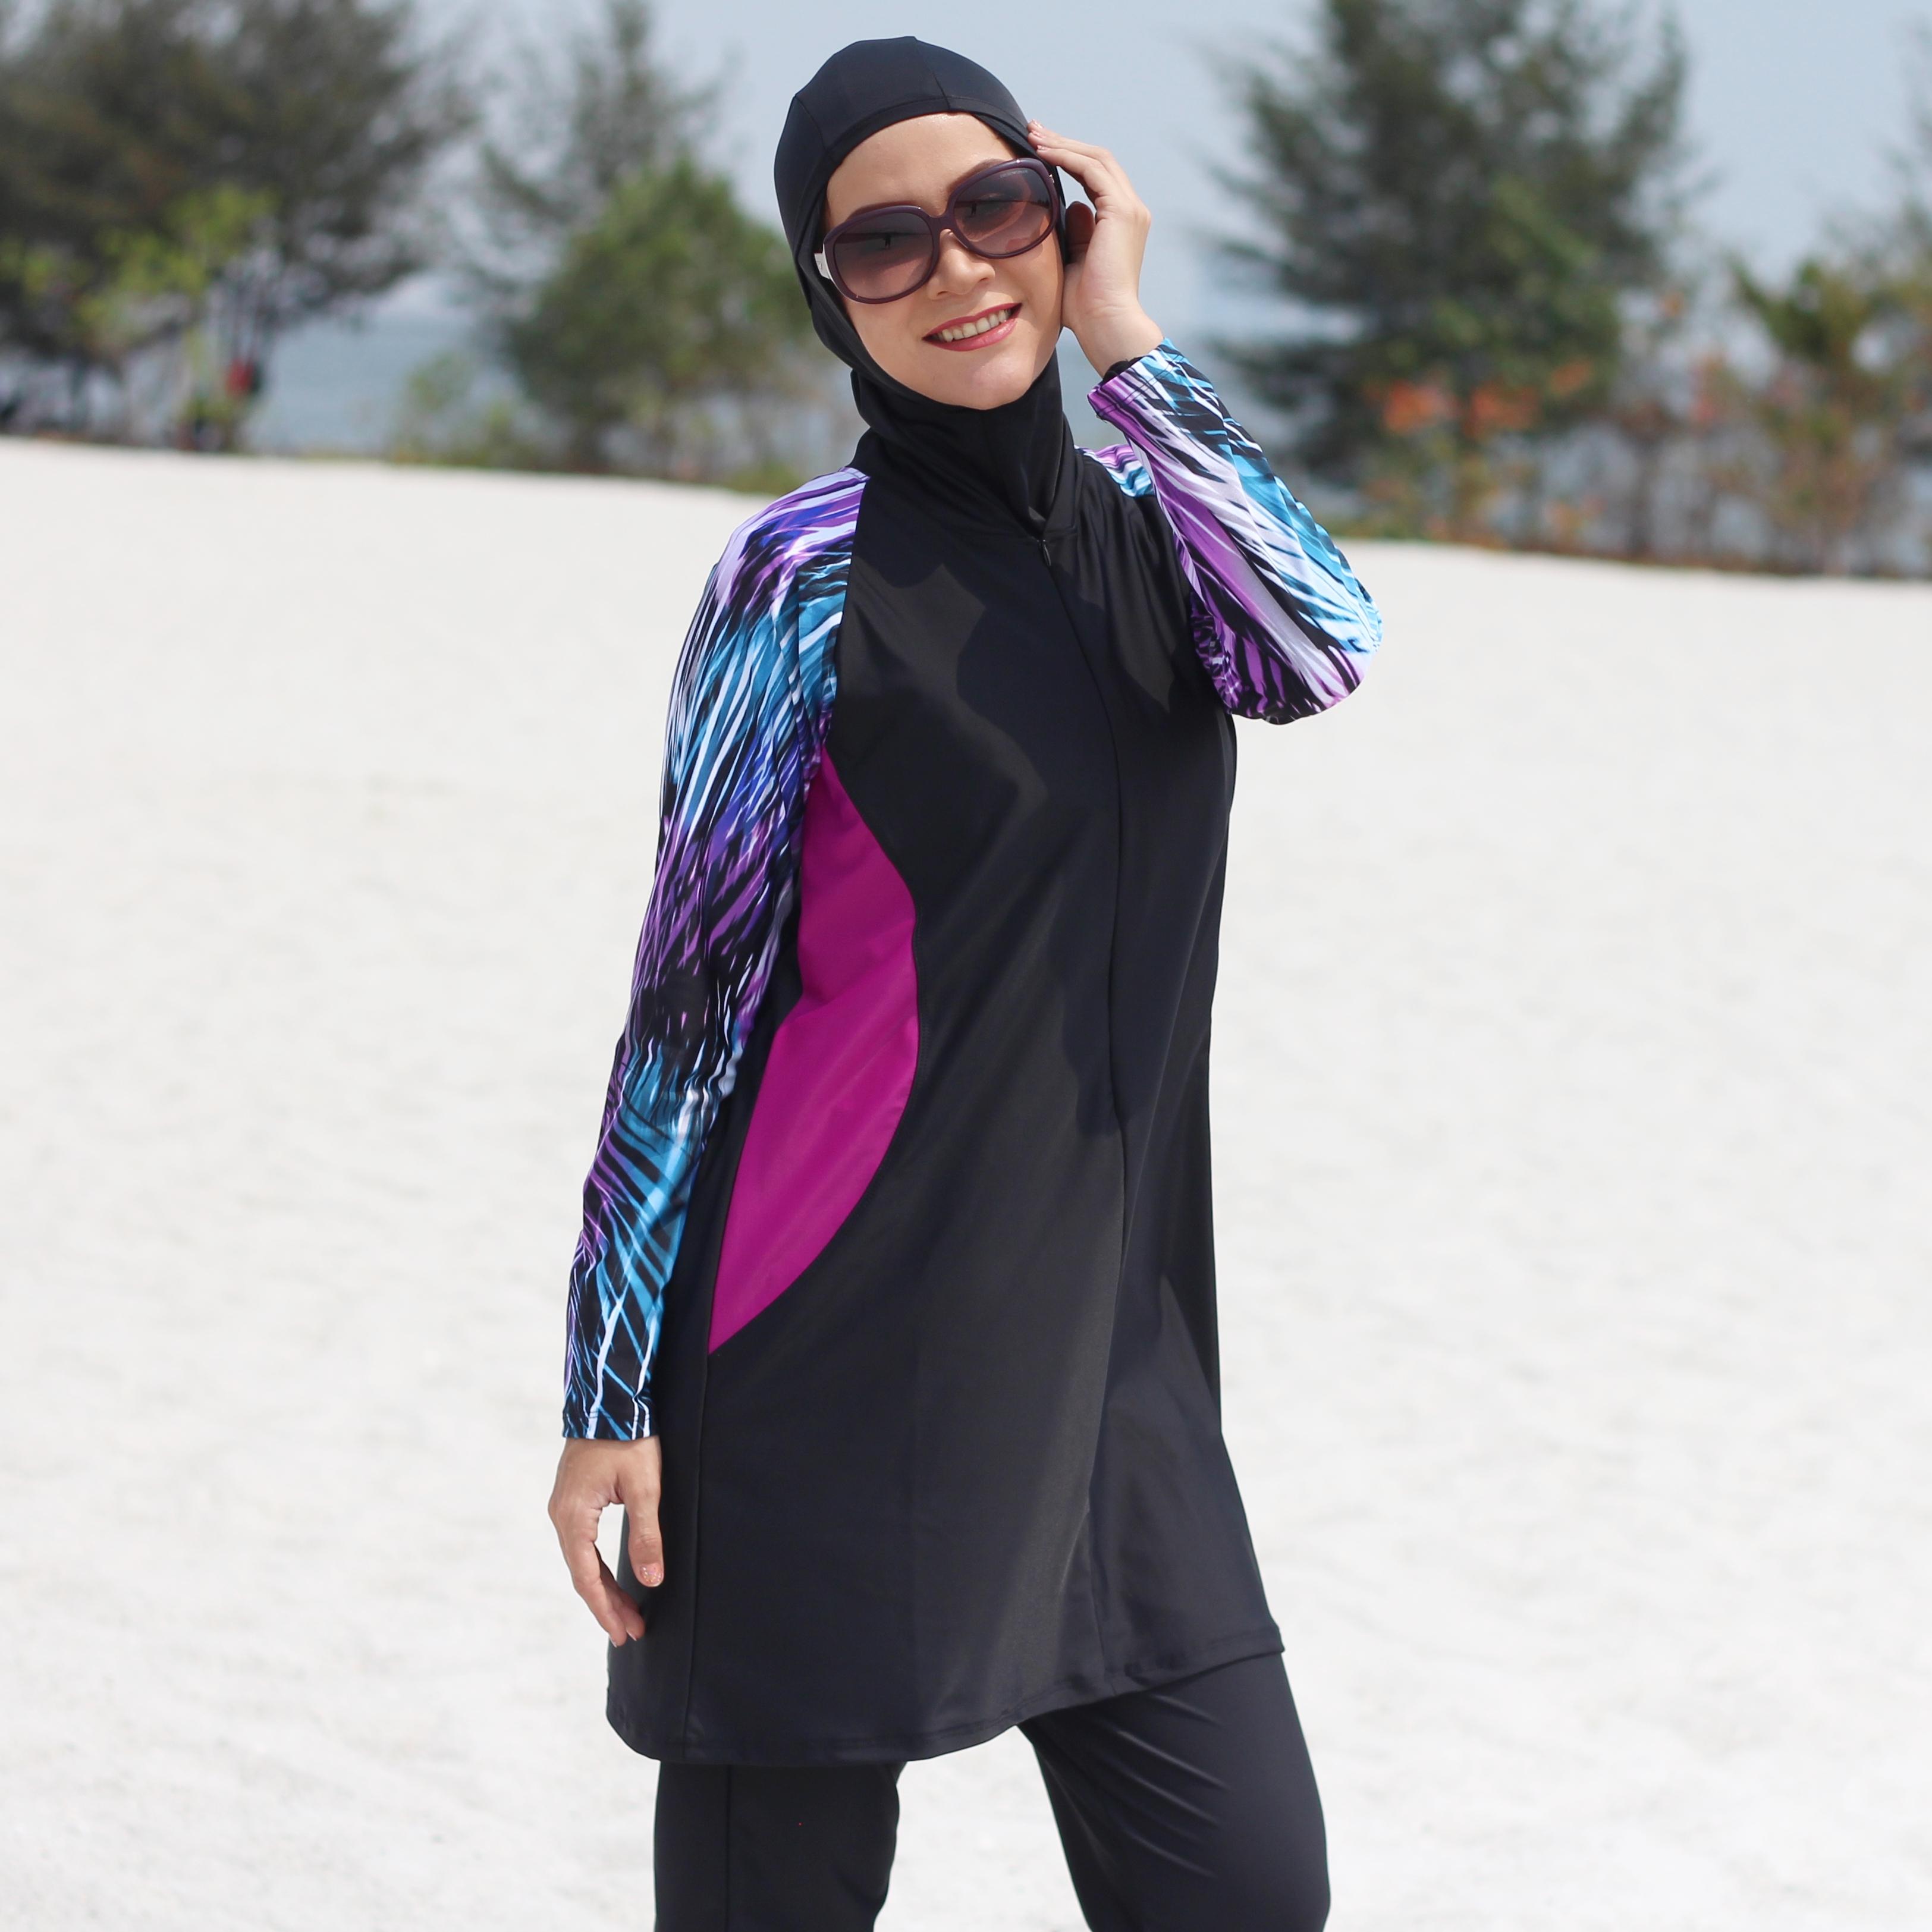 ADR04B/S Baju Renang Adra